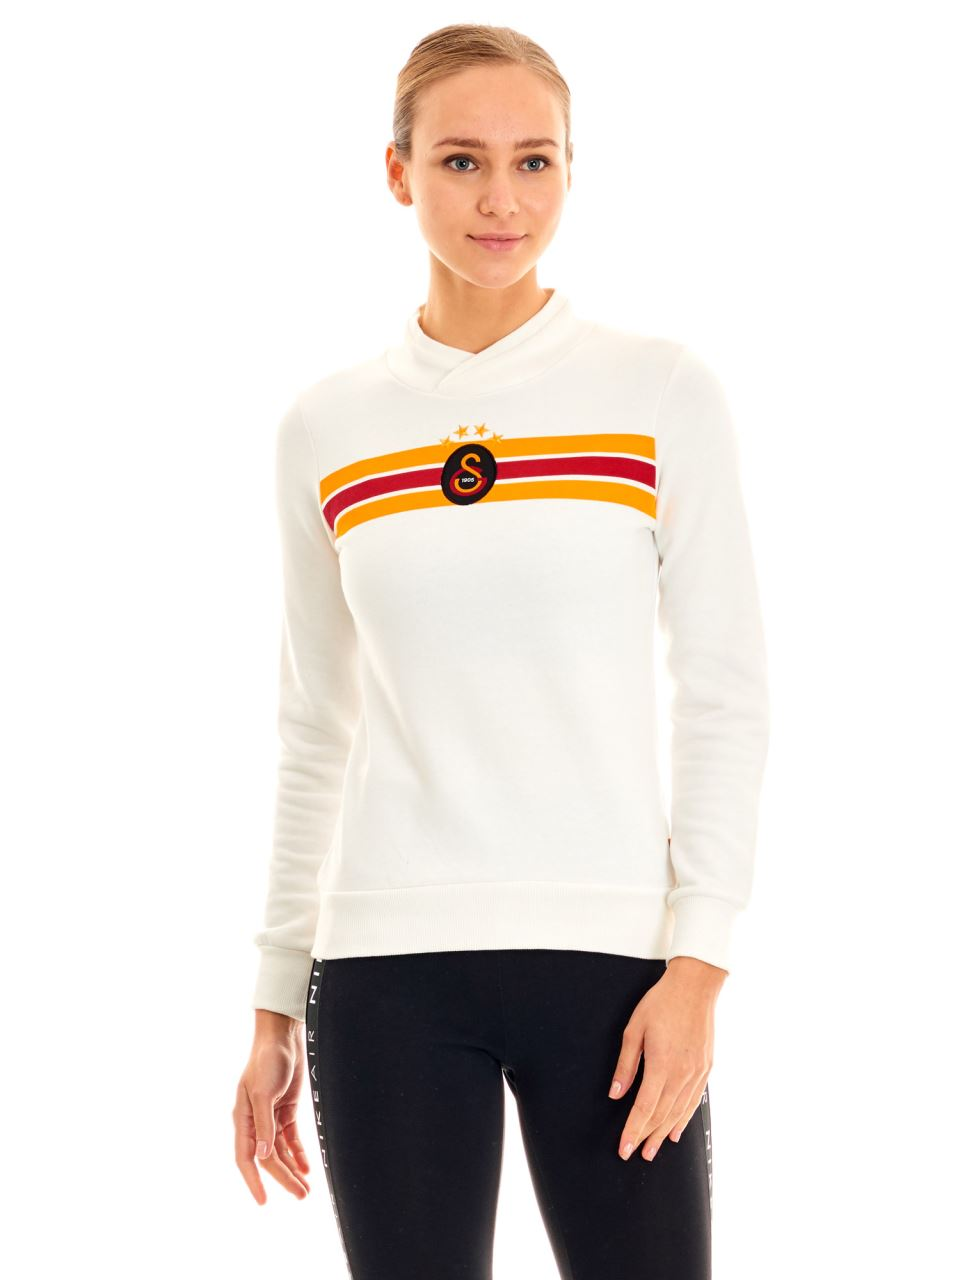 K85122 Sweatshirt